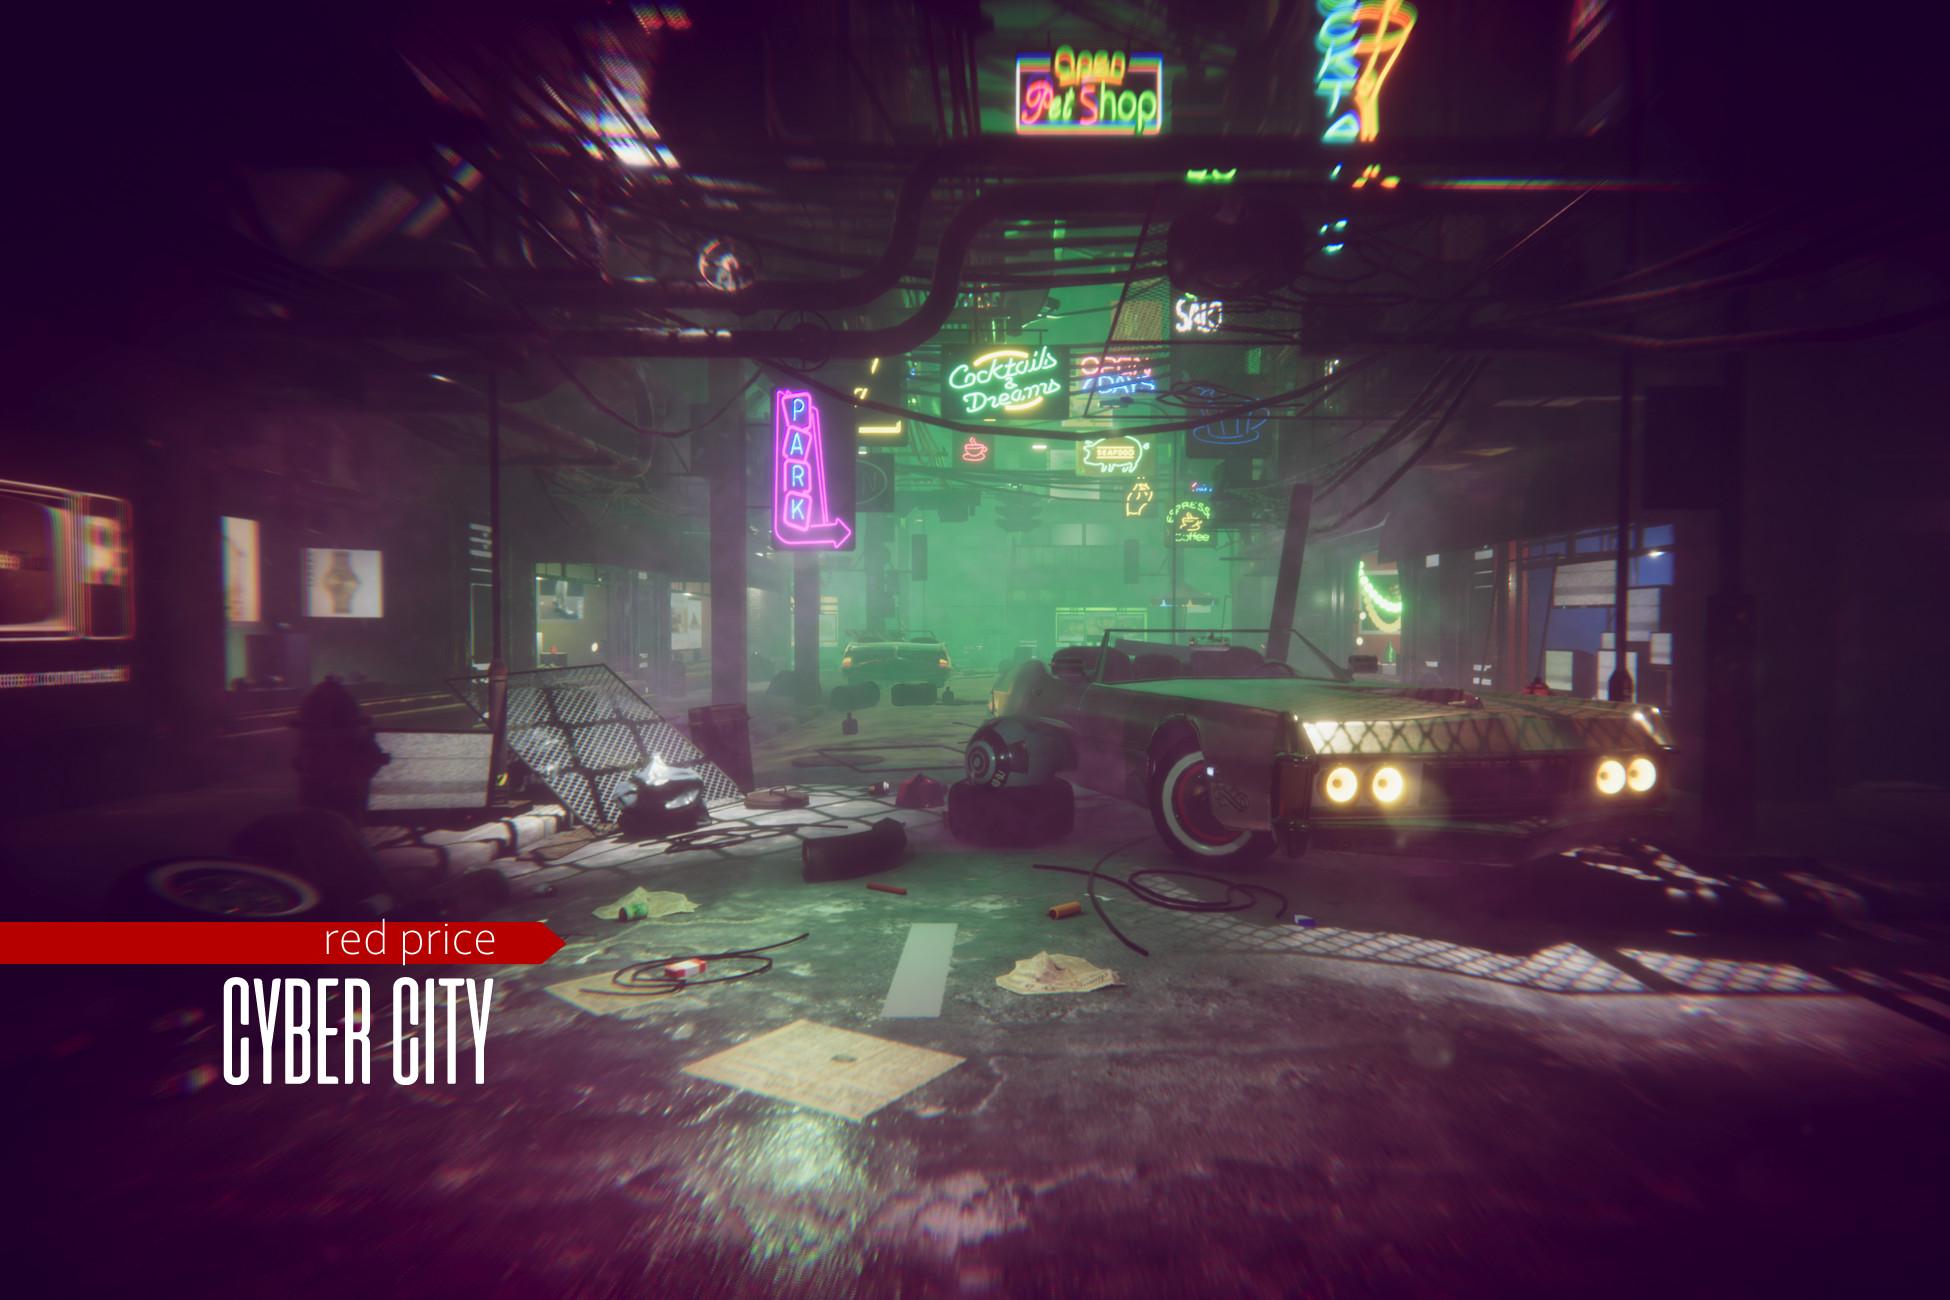 cyberpunk - Cyber City